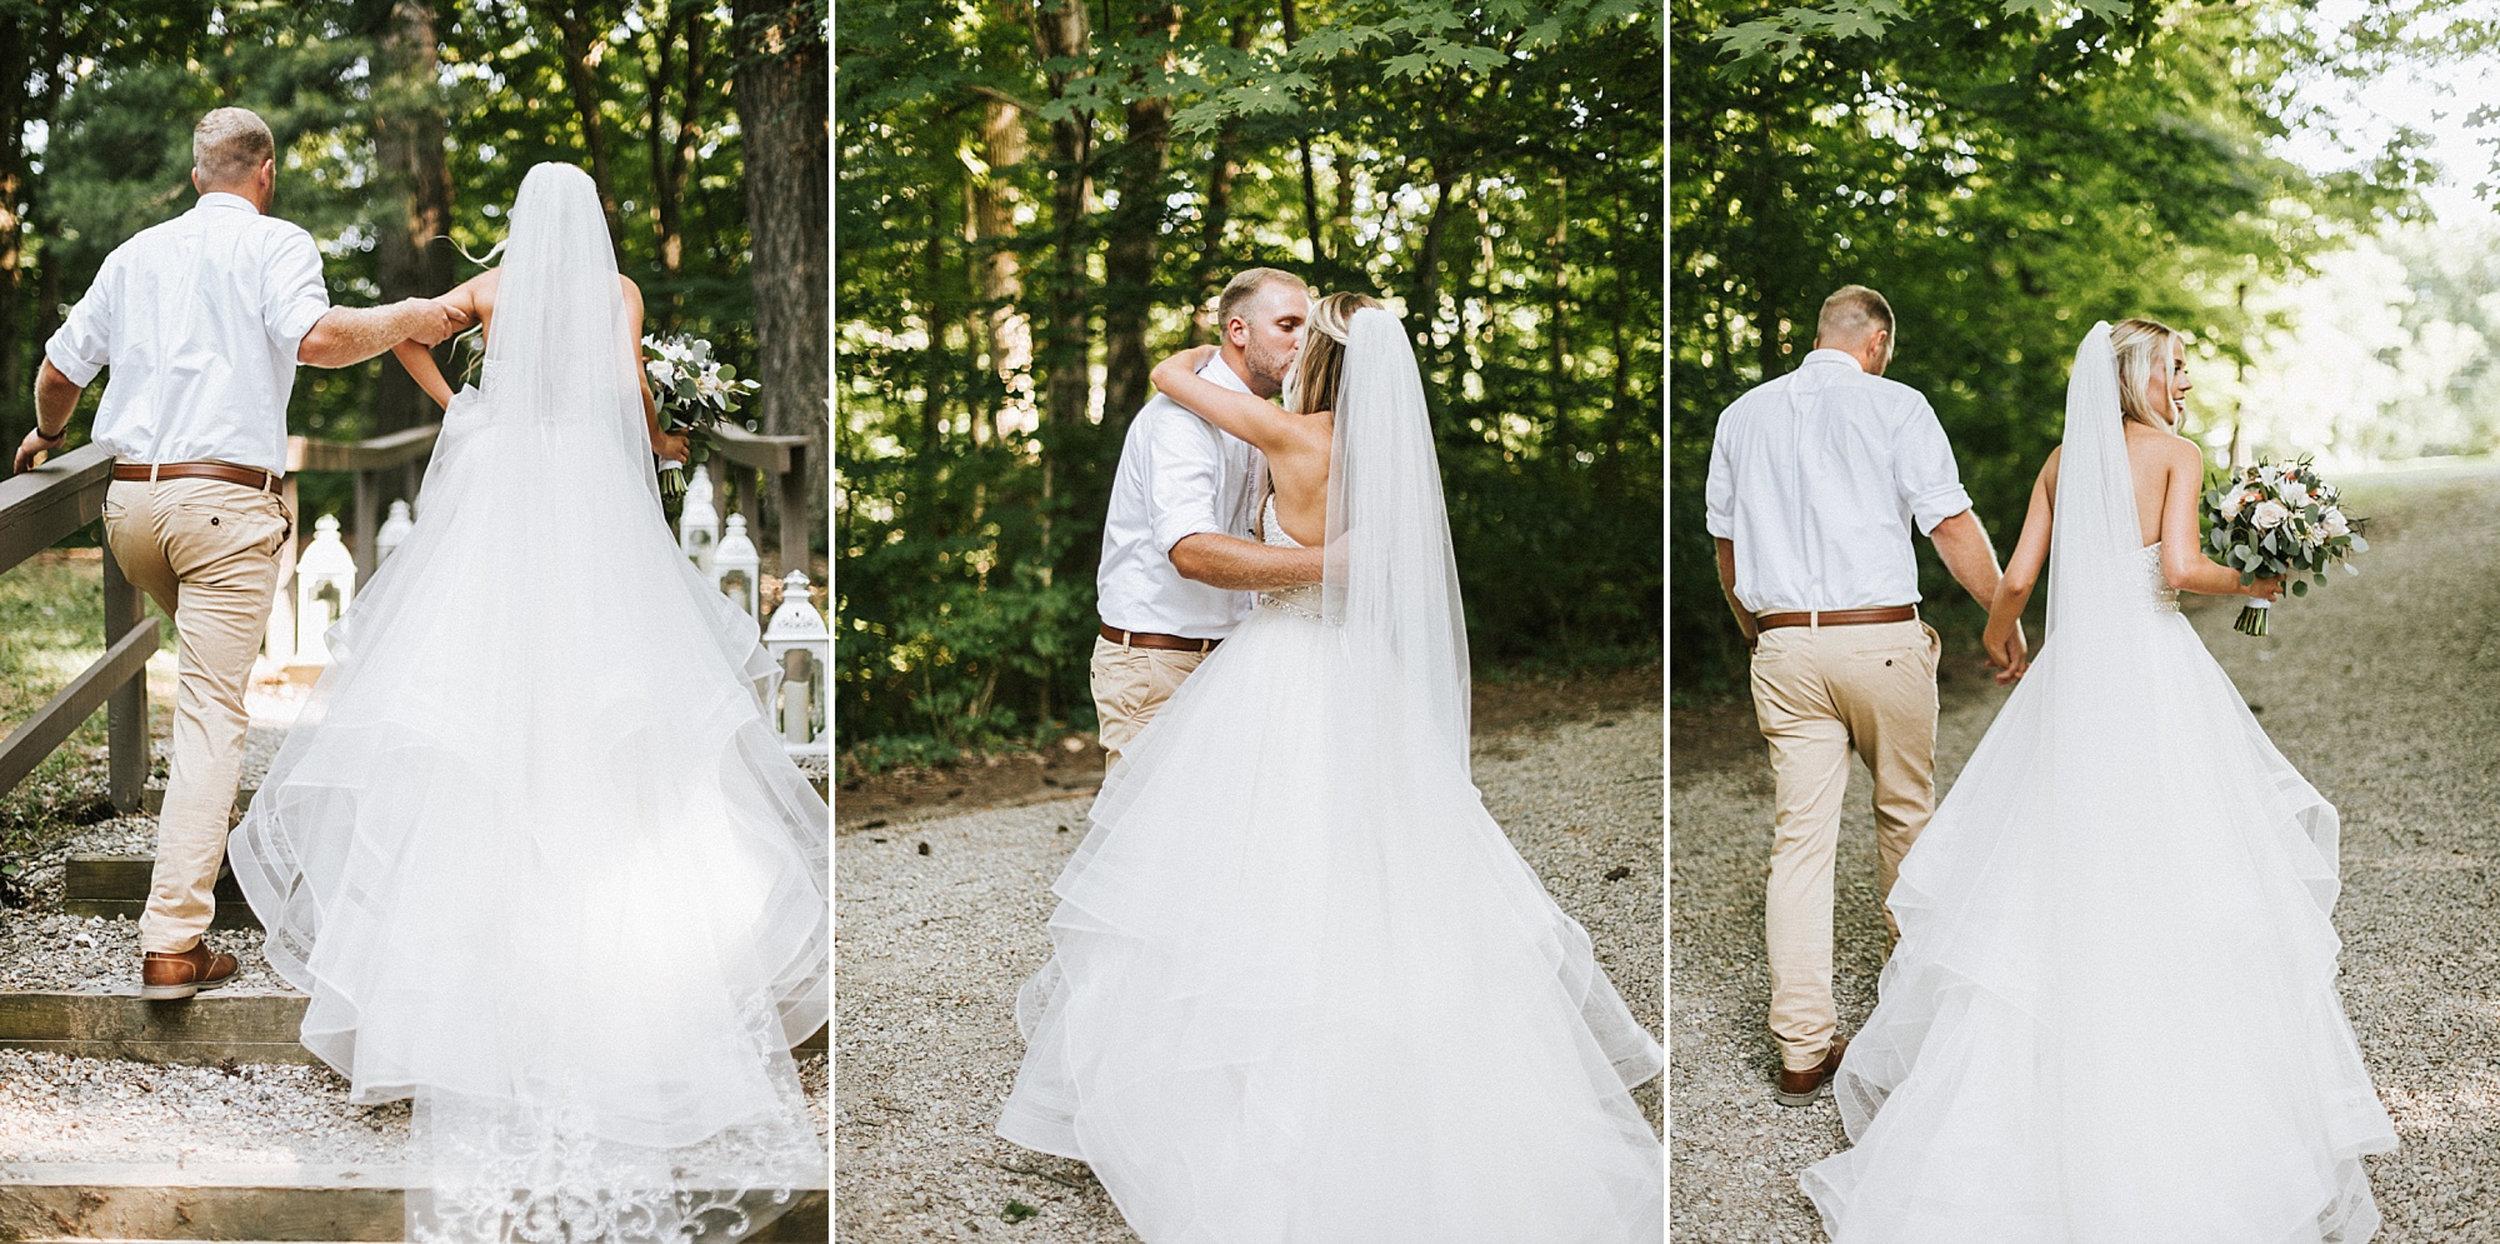 Brooke Townsend Photography - Cincinnati Wedding Photographer (85 of 153).jpg